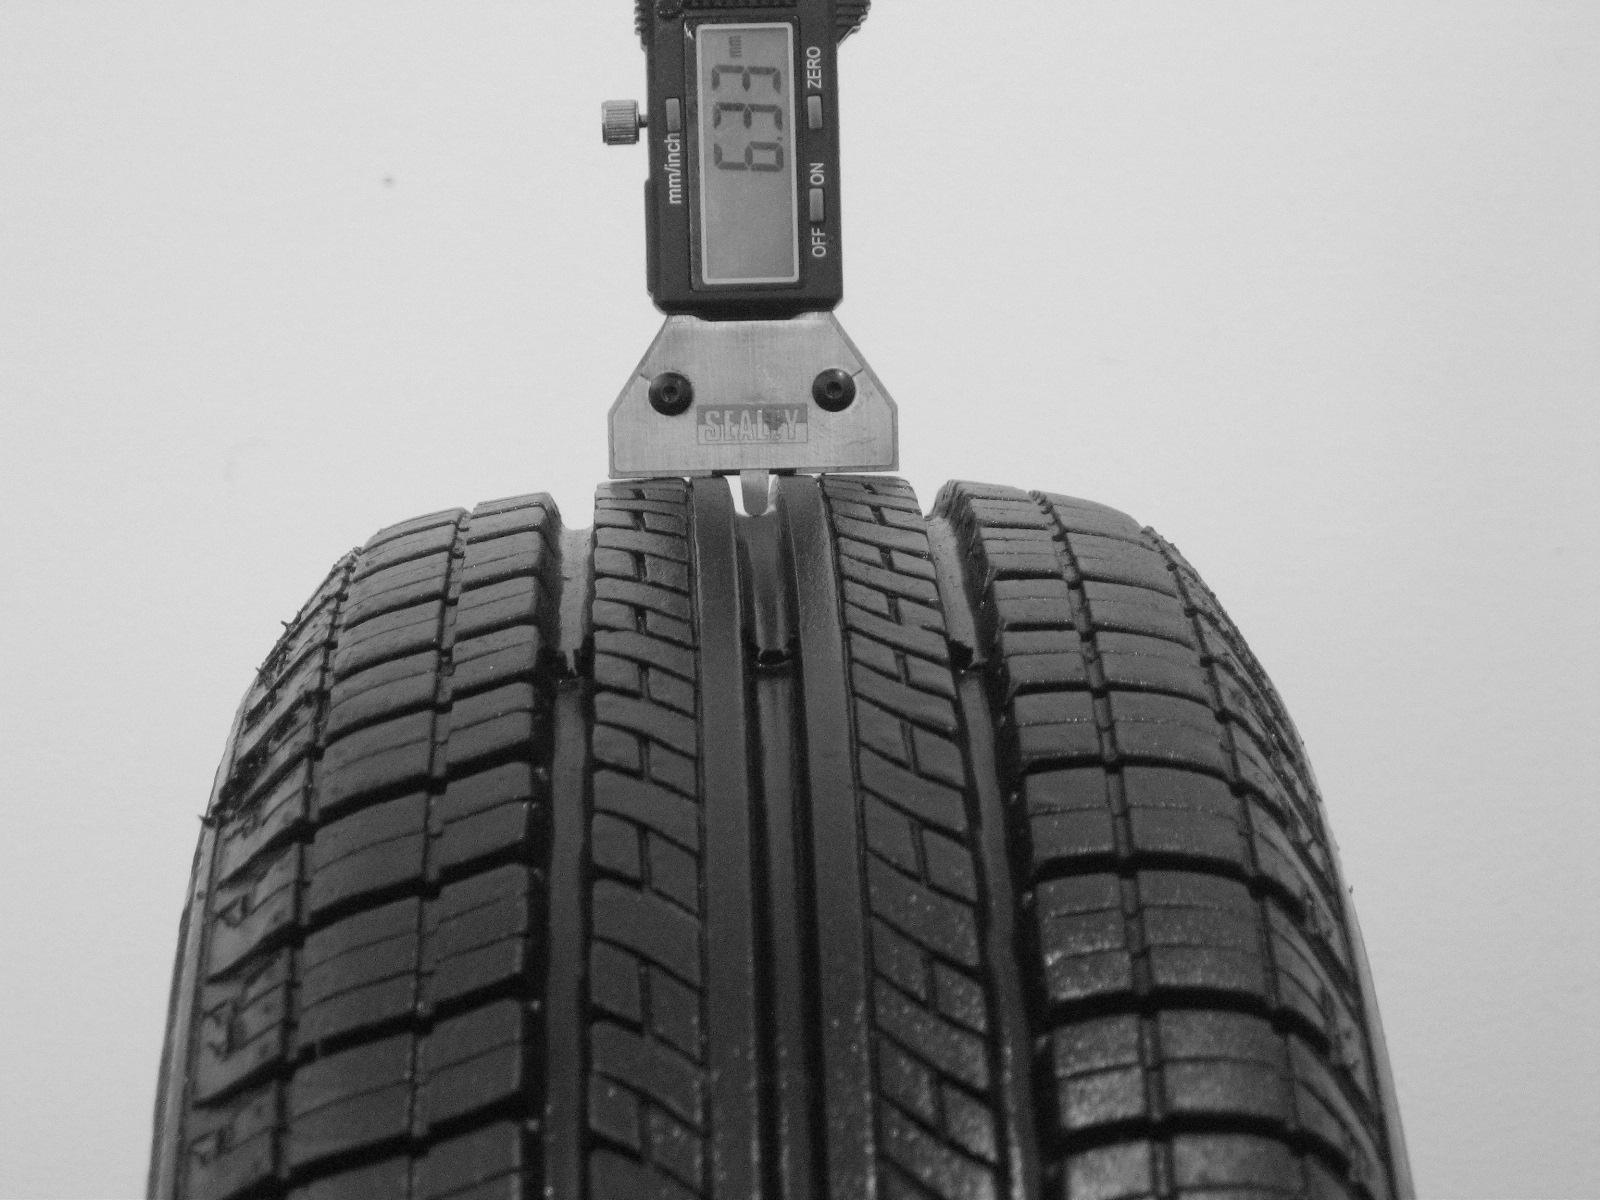 Použité-Pneu-Bazar - 165/70 R13 PNEUVRANÍK ECO TOURING -kusovka-rezerva 3mm